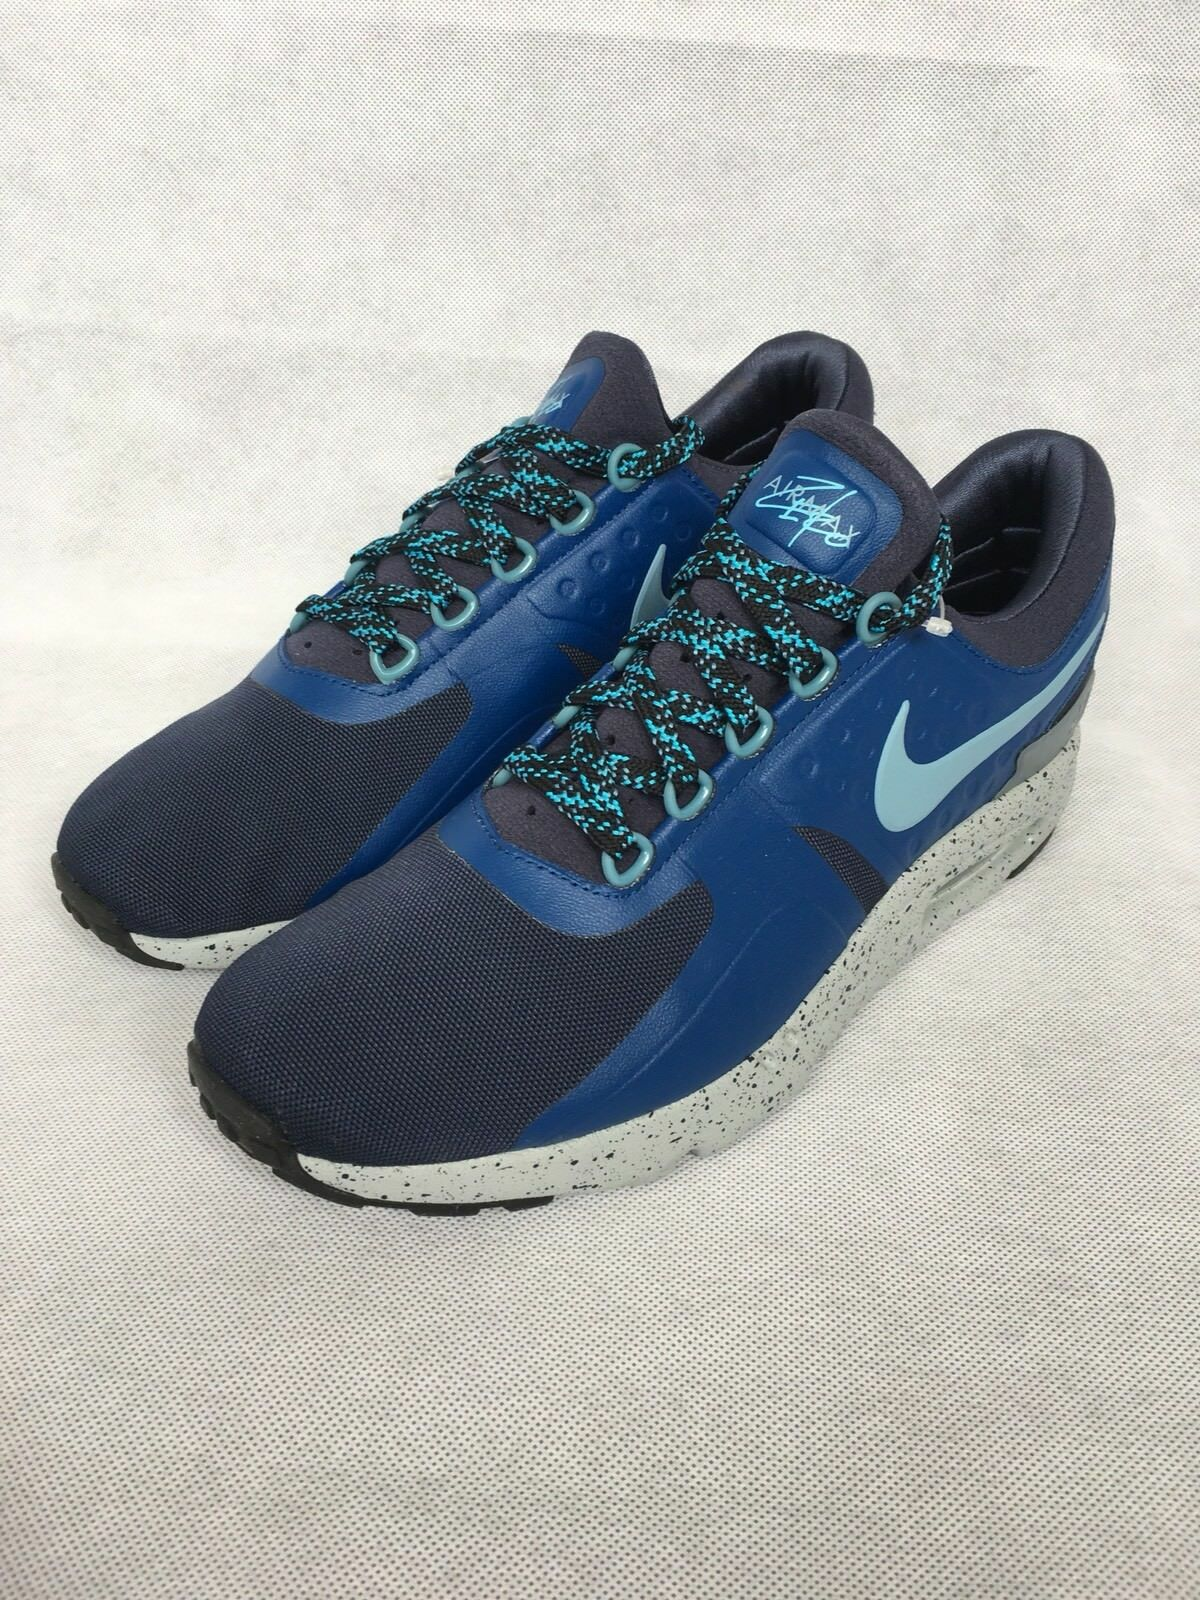 Nike Air Max Zero SE Blue Grey Uk Size 8 918232-400